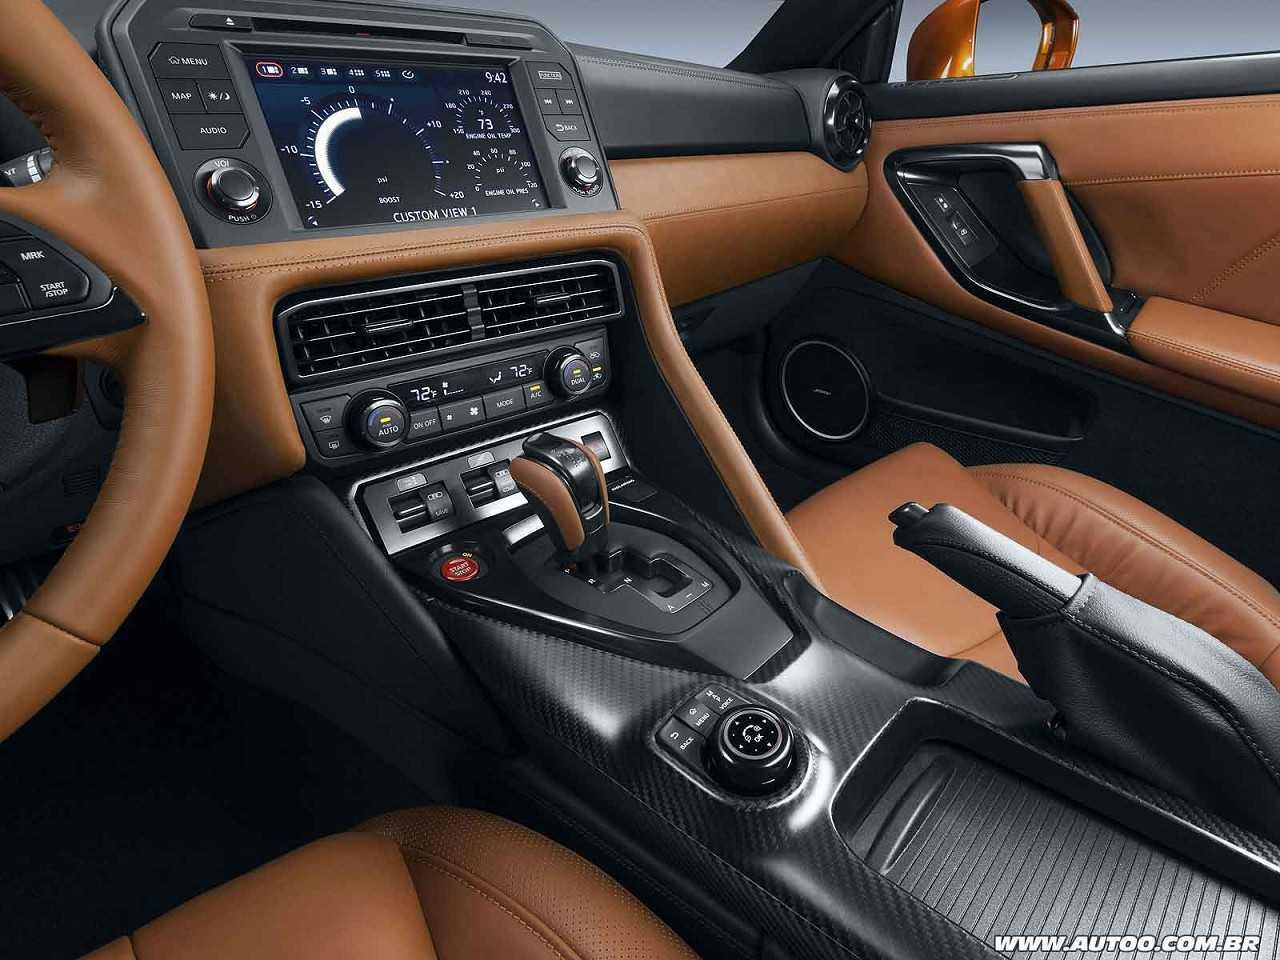 NissanGT-R 2017 - console central